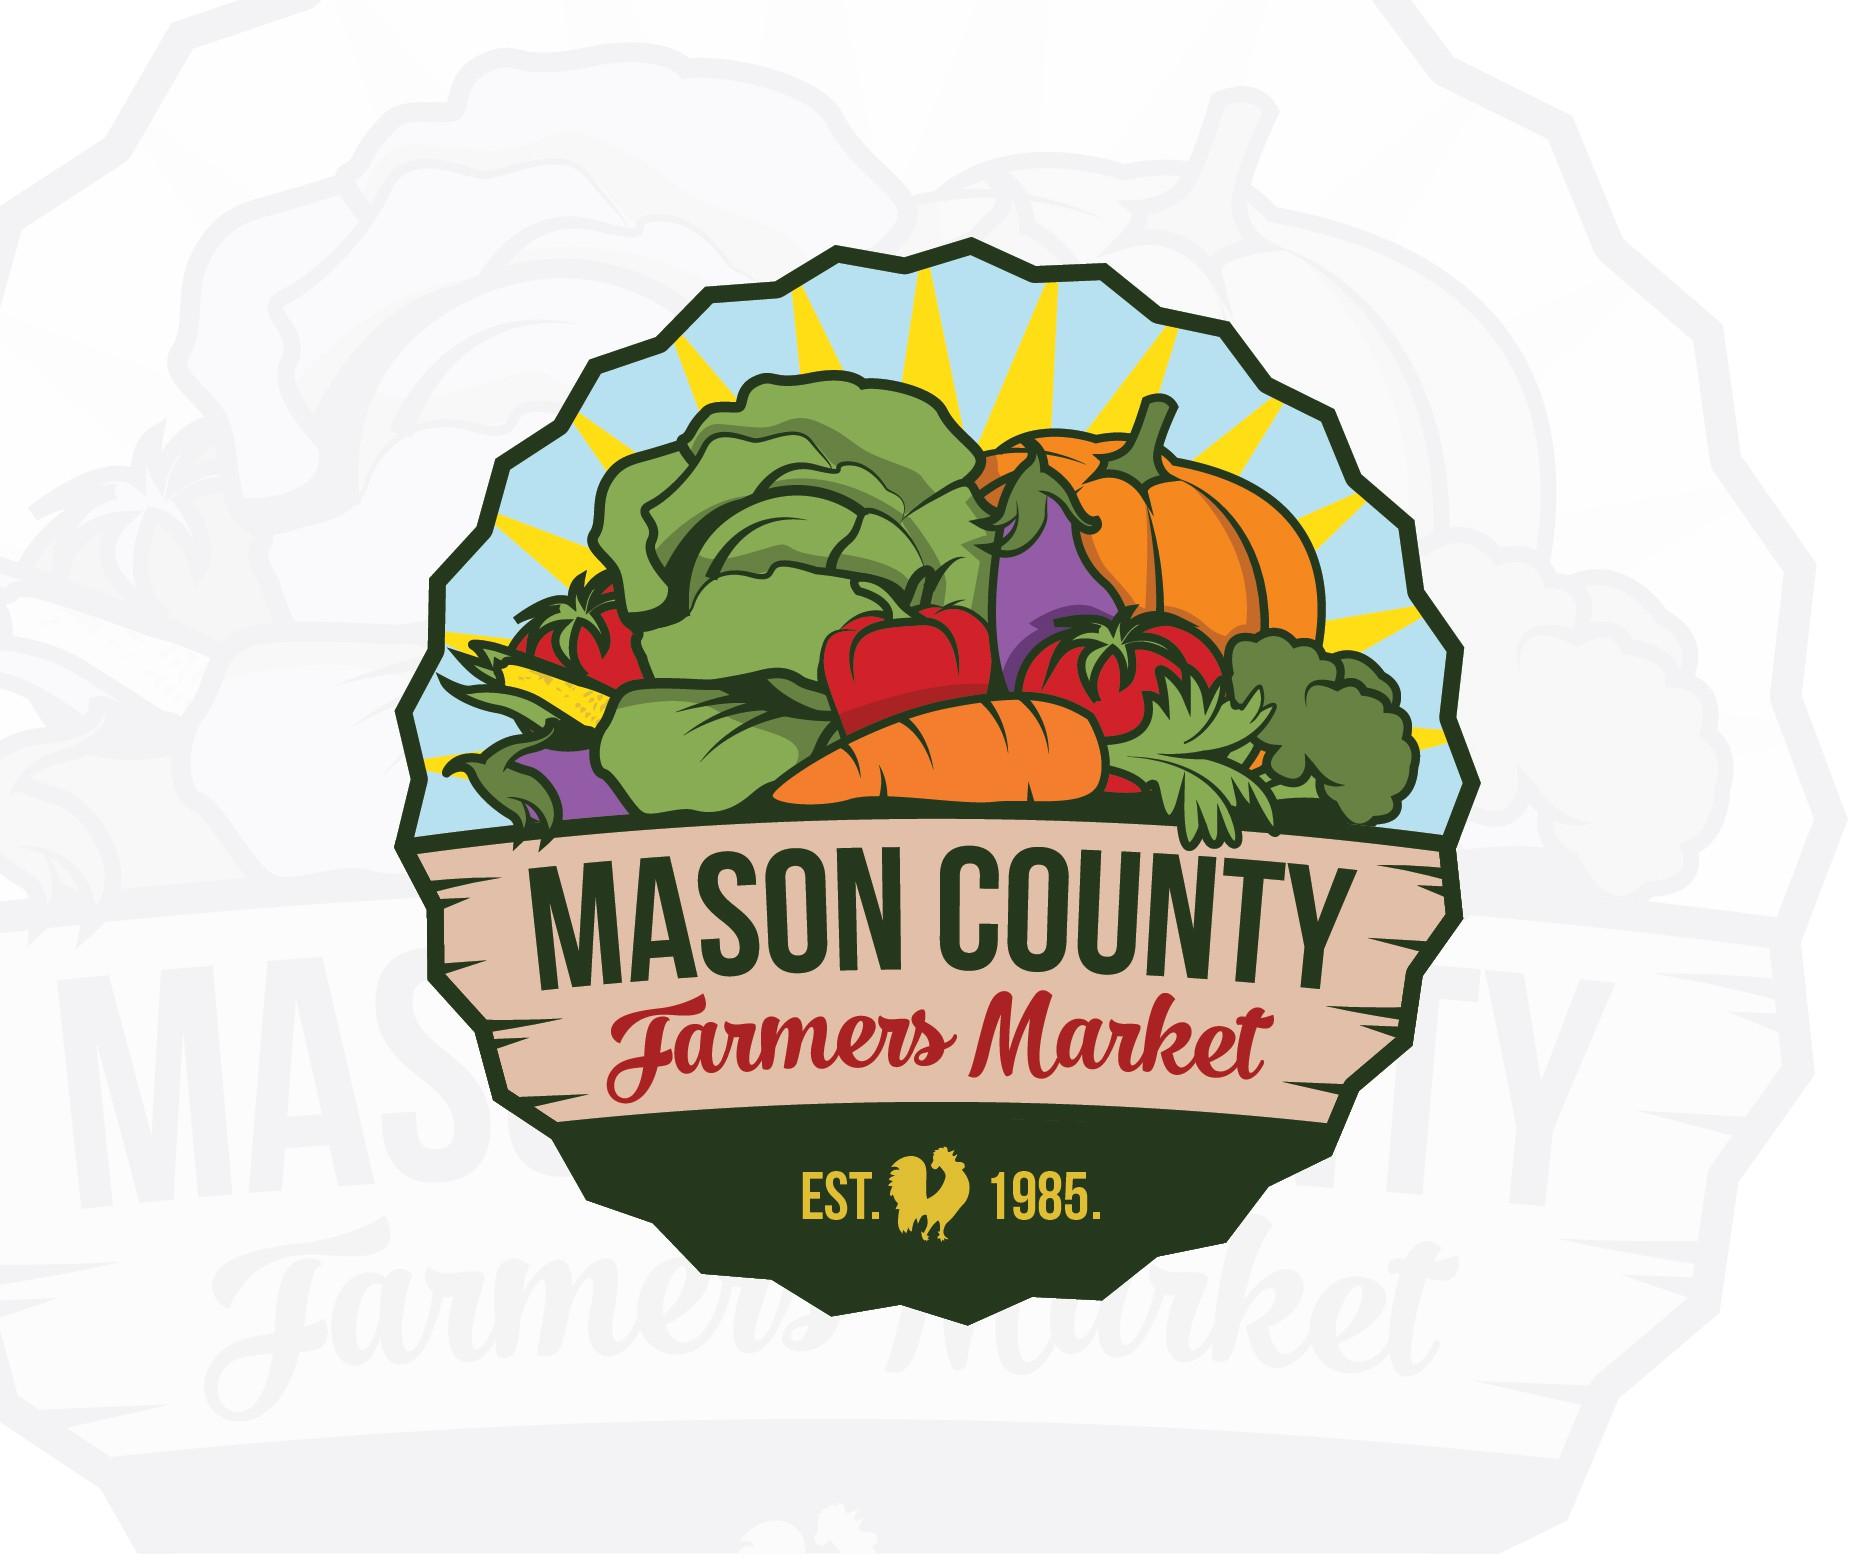 Seeking a rustic emblem design for the Mason County Farmers Market